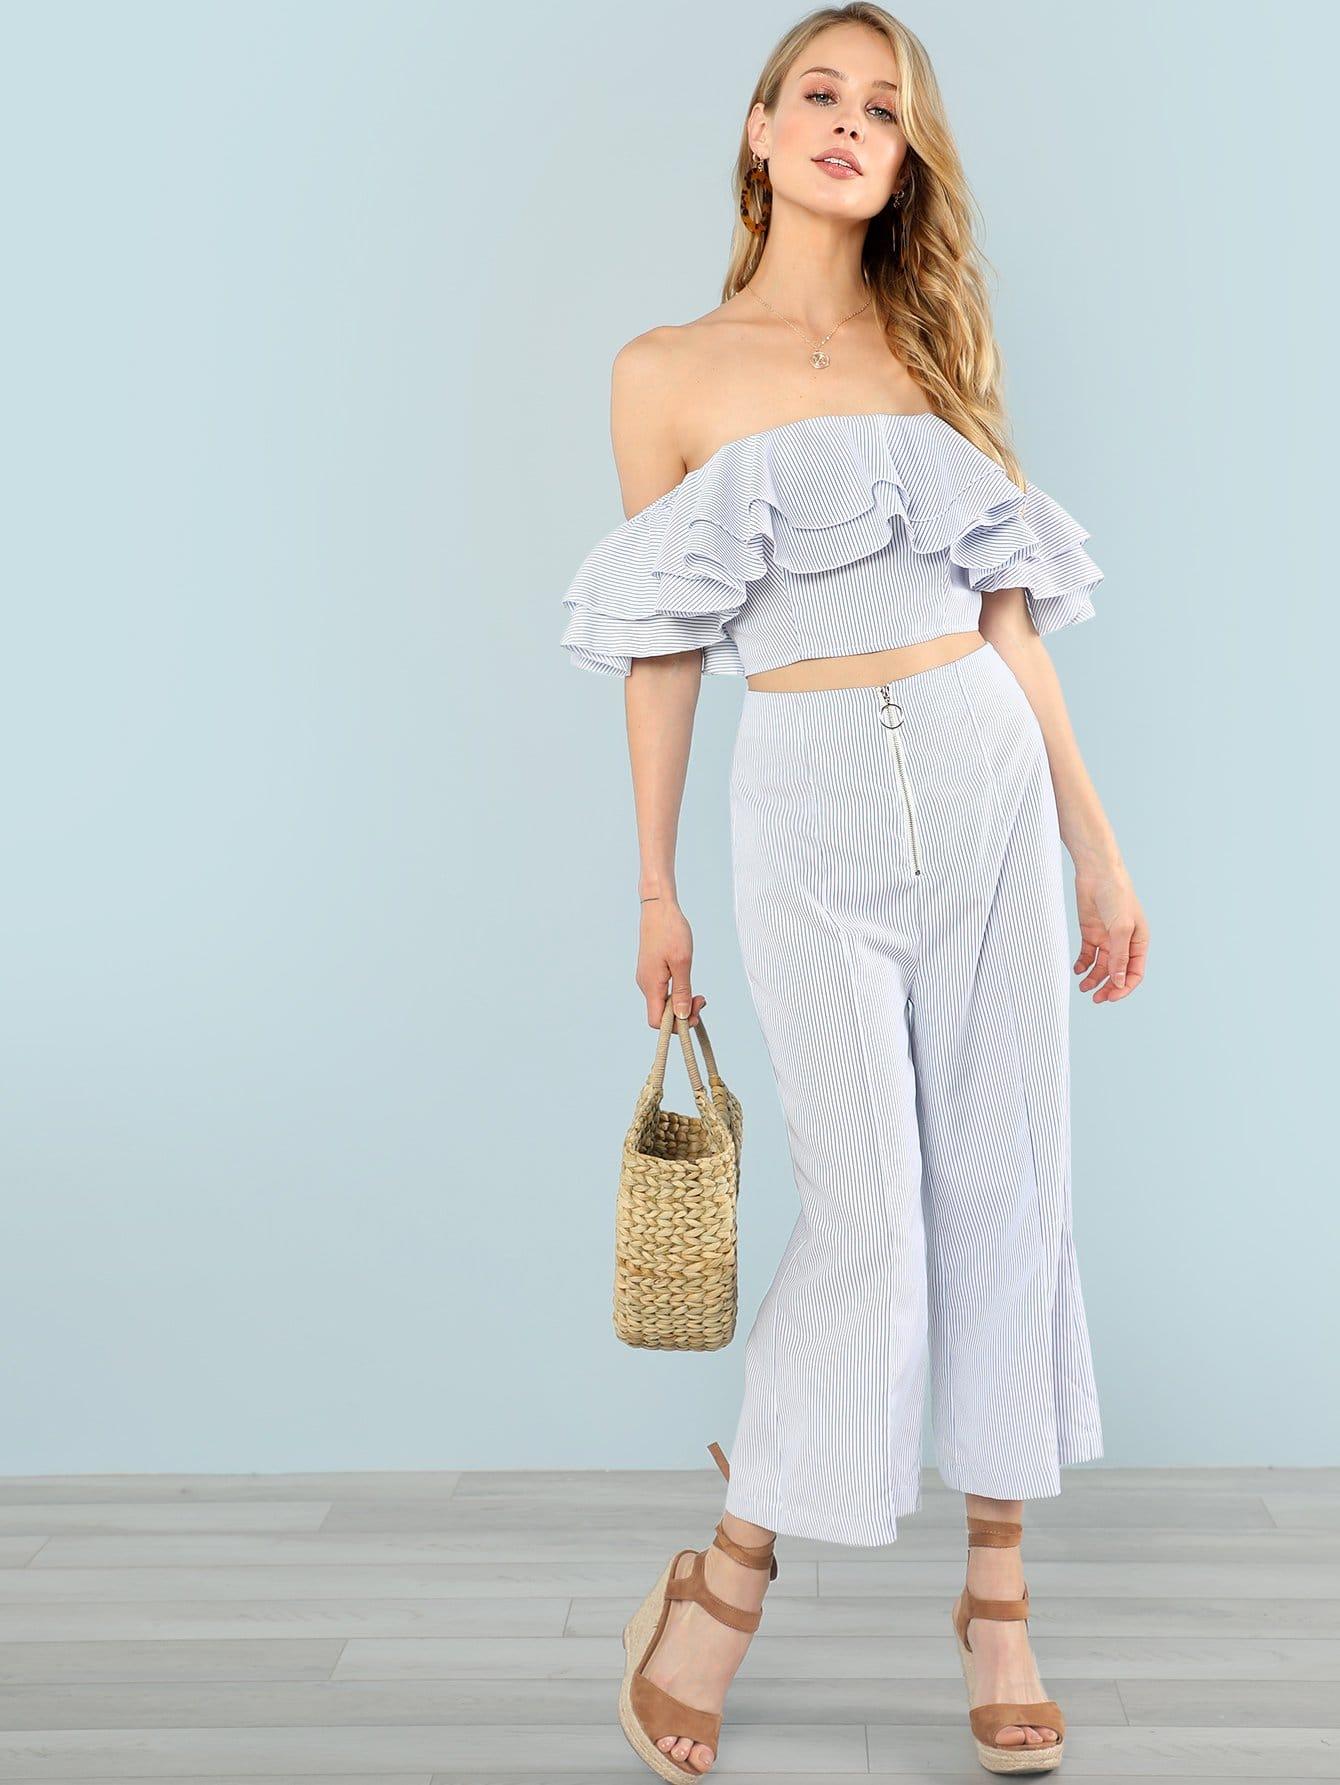 Купить Комплект топ бандо с оборками и широкие брюки, Allie Leggett, SheIn